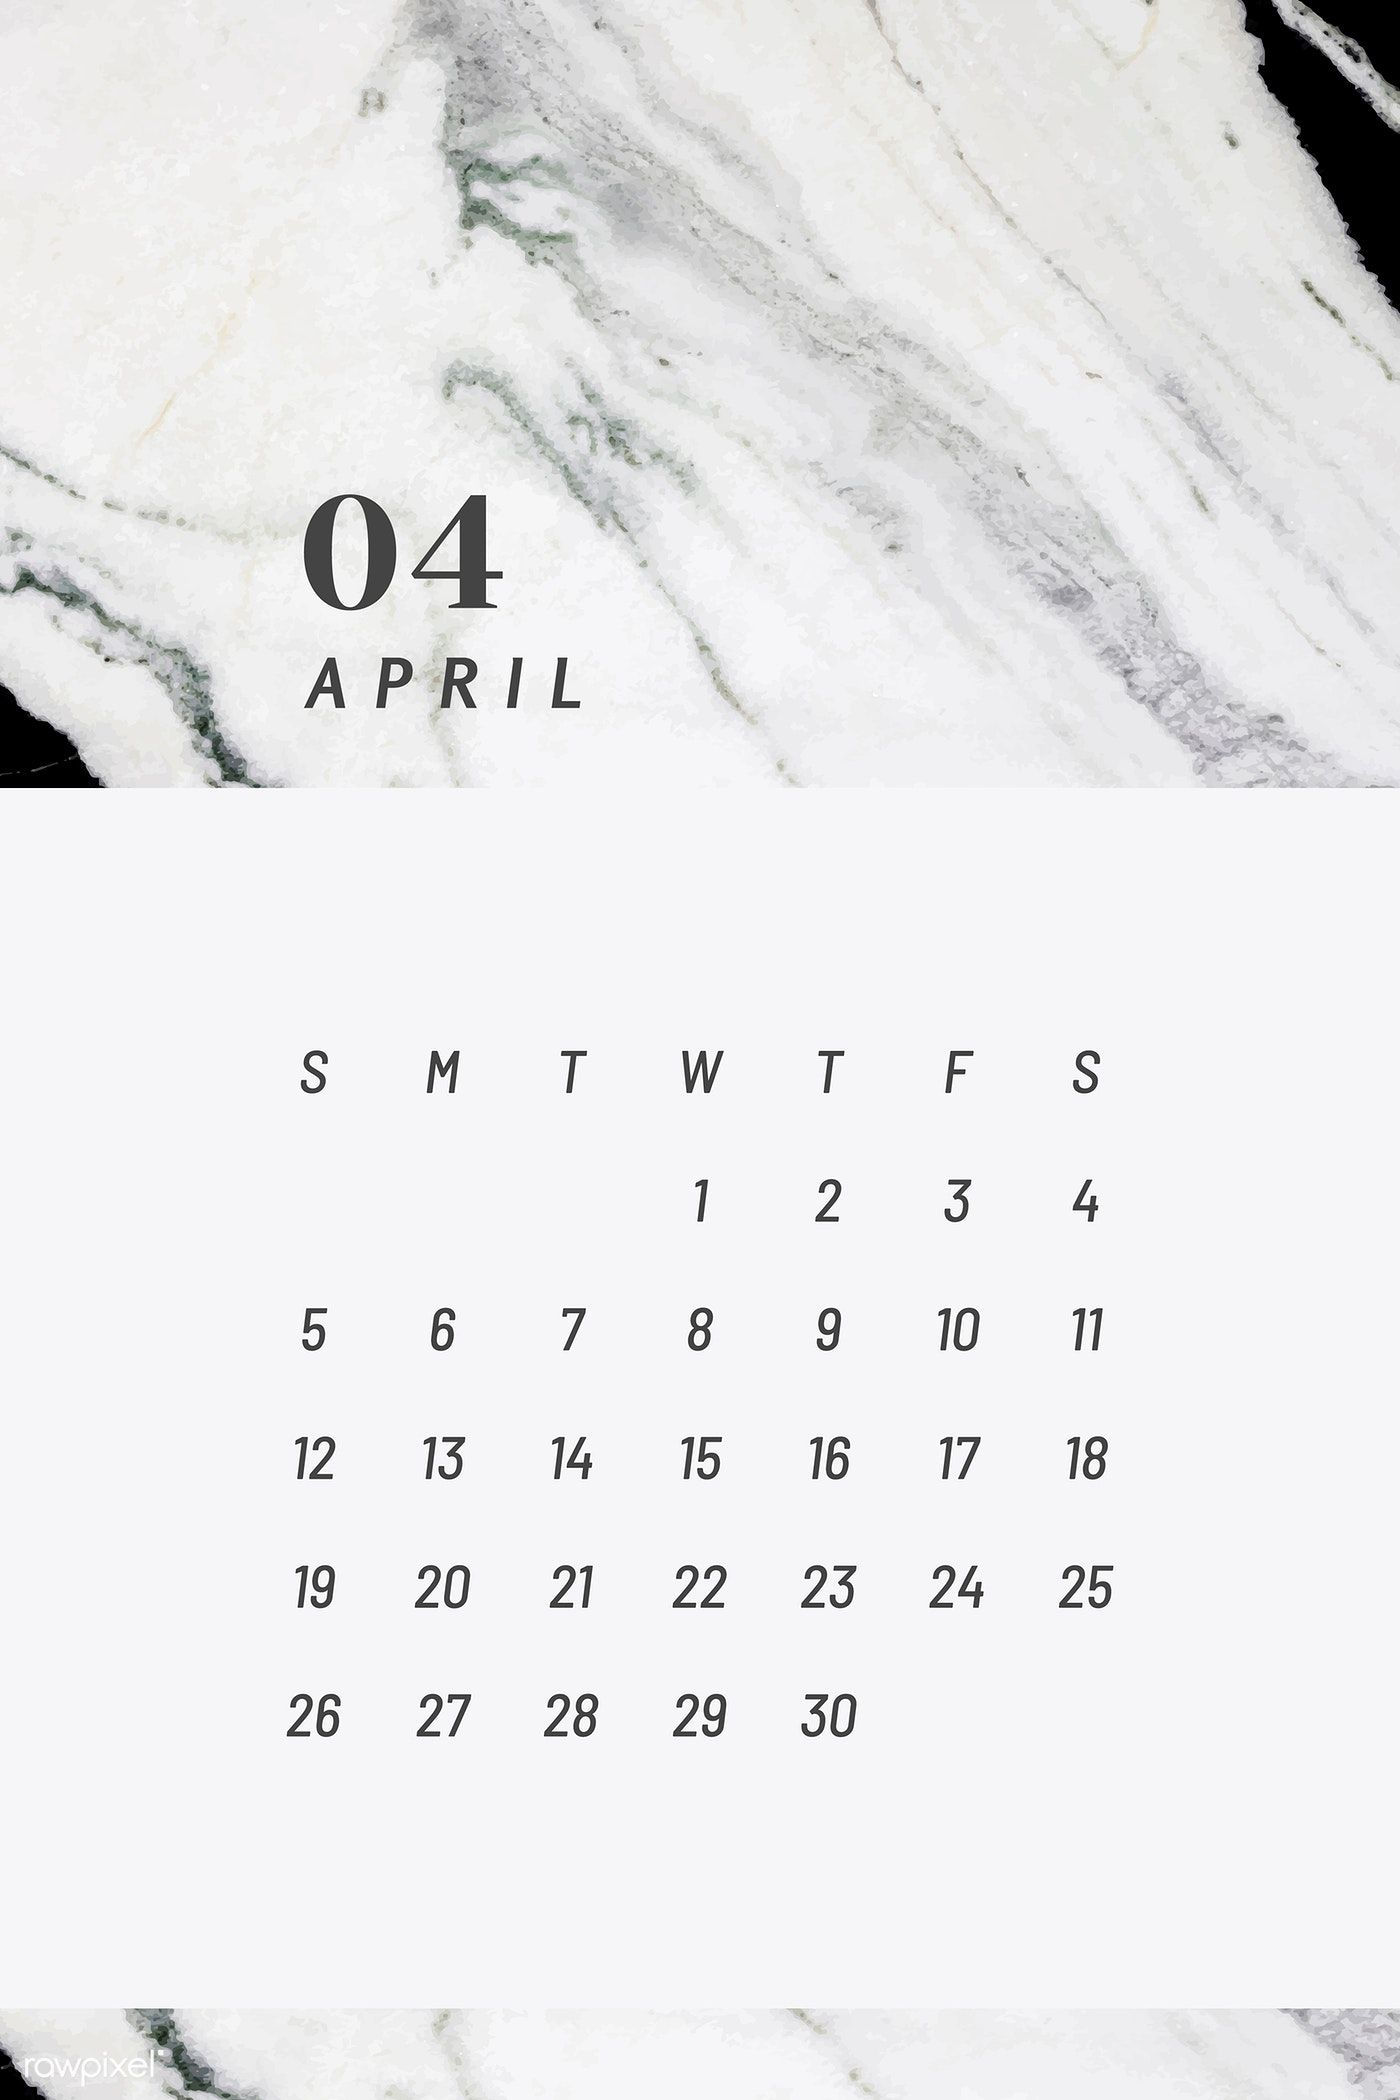 Download Premium Vector Of Black And White April Calendar 2020